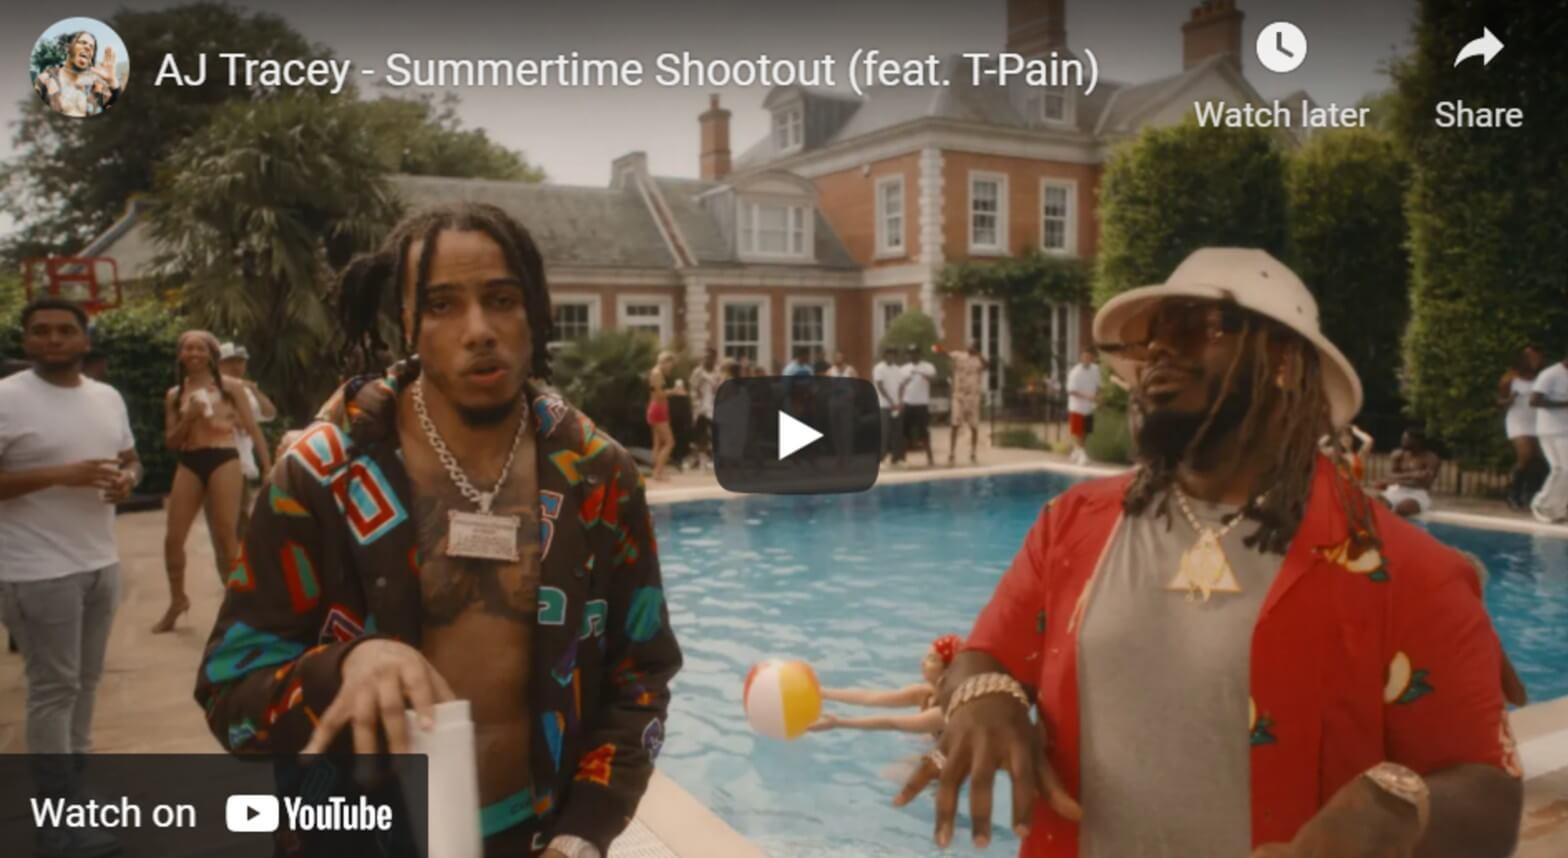 AJ_Tracey_Summertime_Shootout.jpg